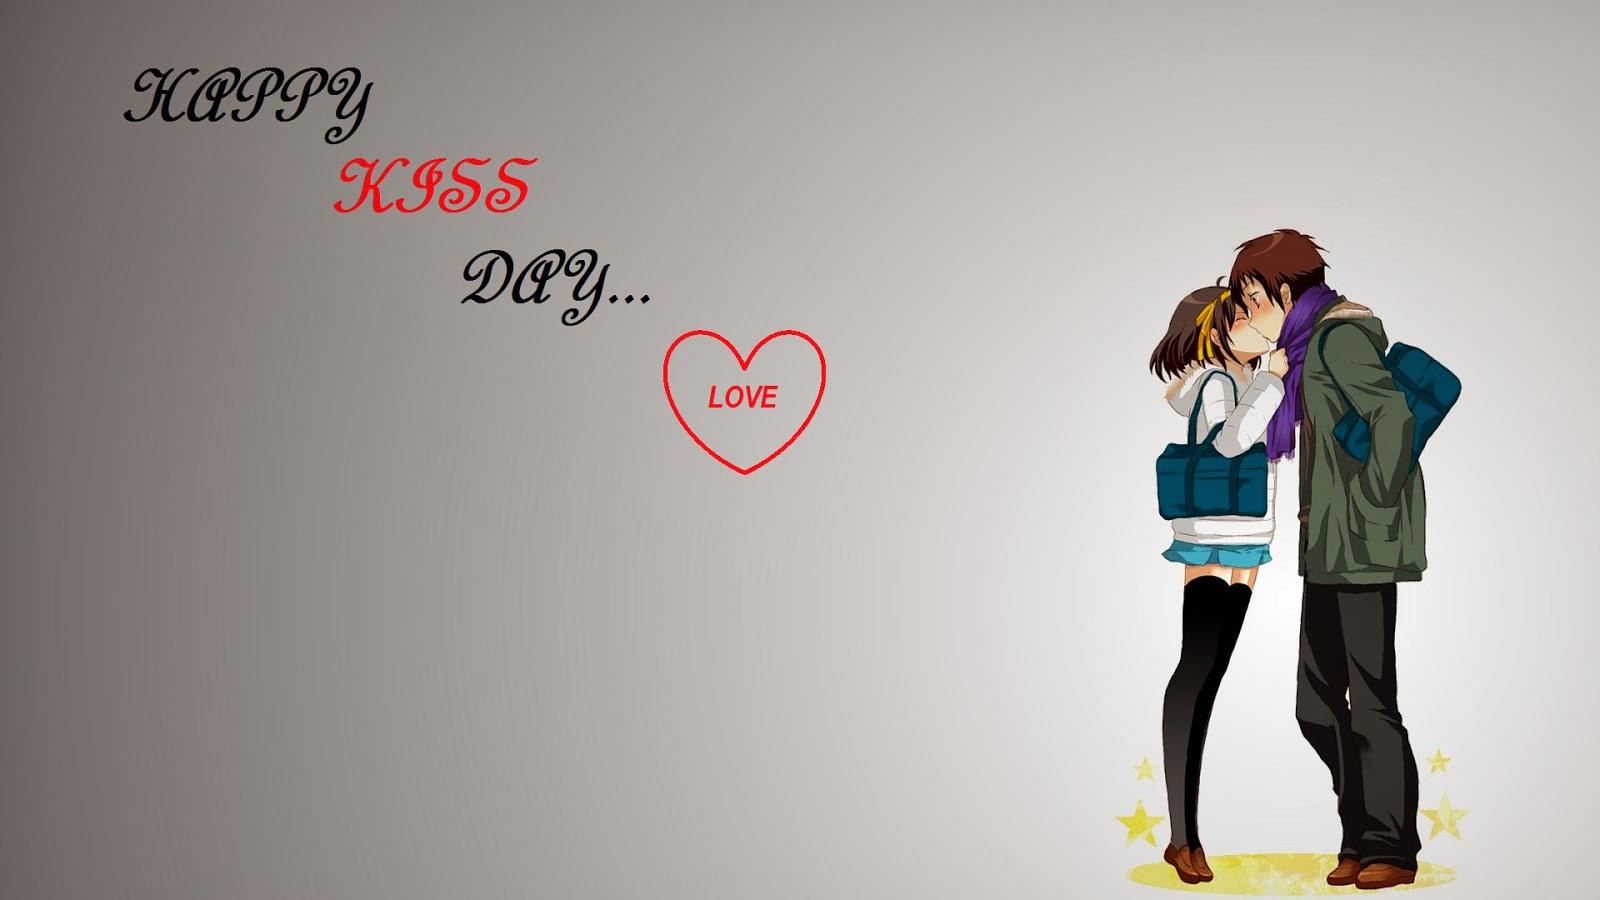 Happy Kiss Day Image